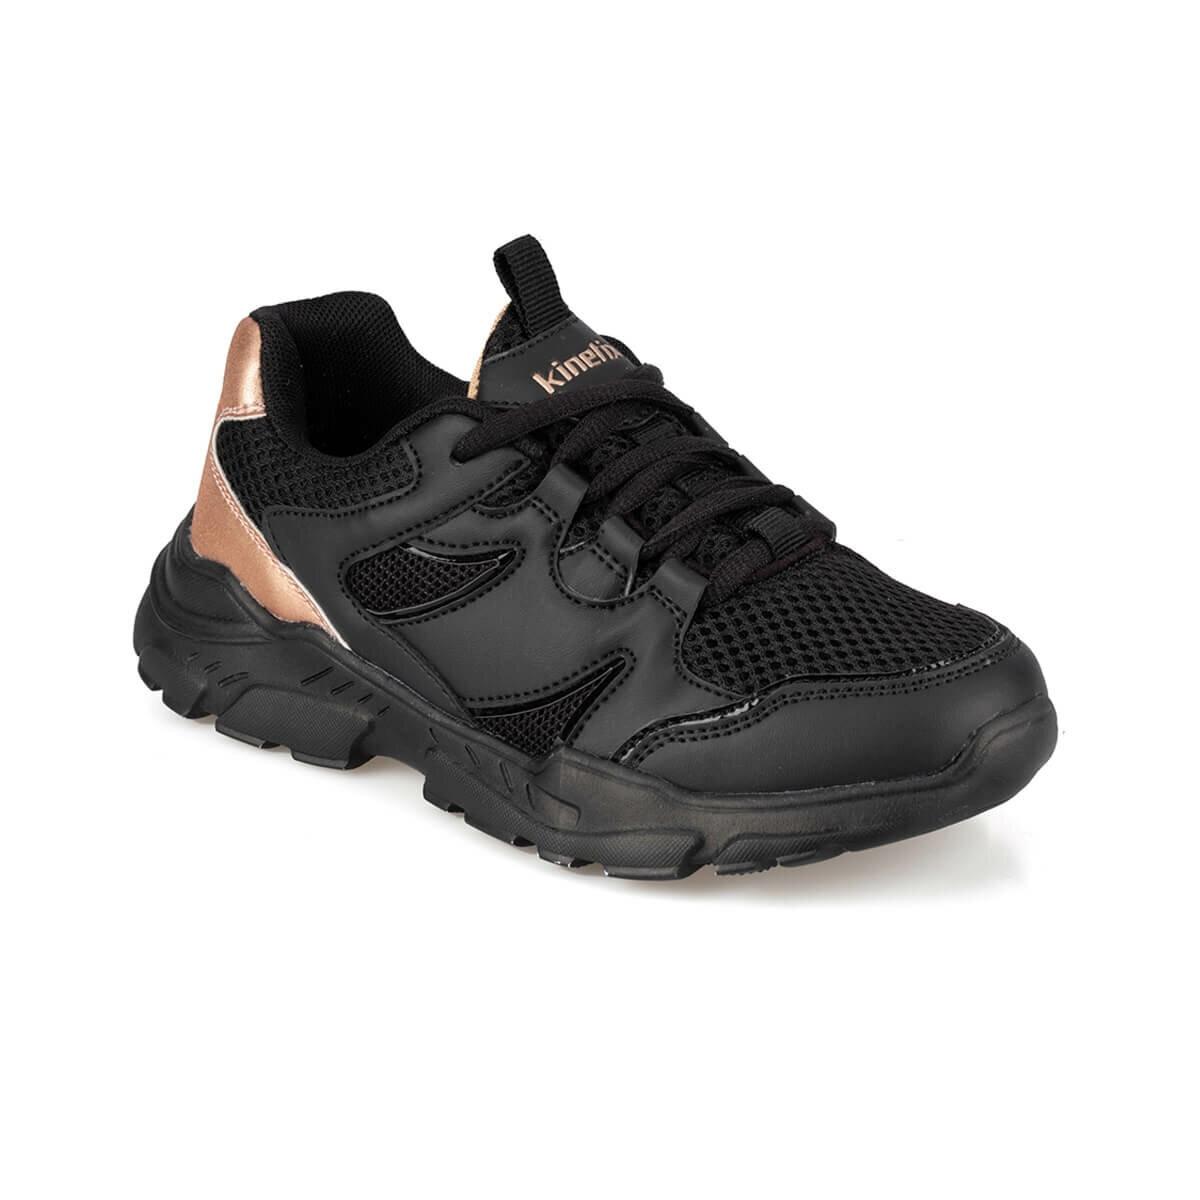 FLO SANDRA 9PR Black Female Child Walking Shoes KINETIX